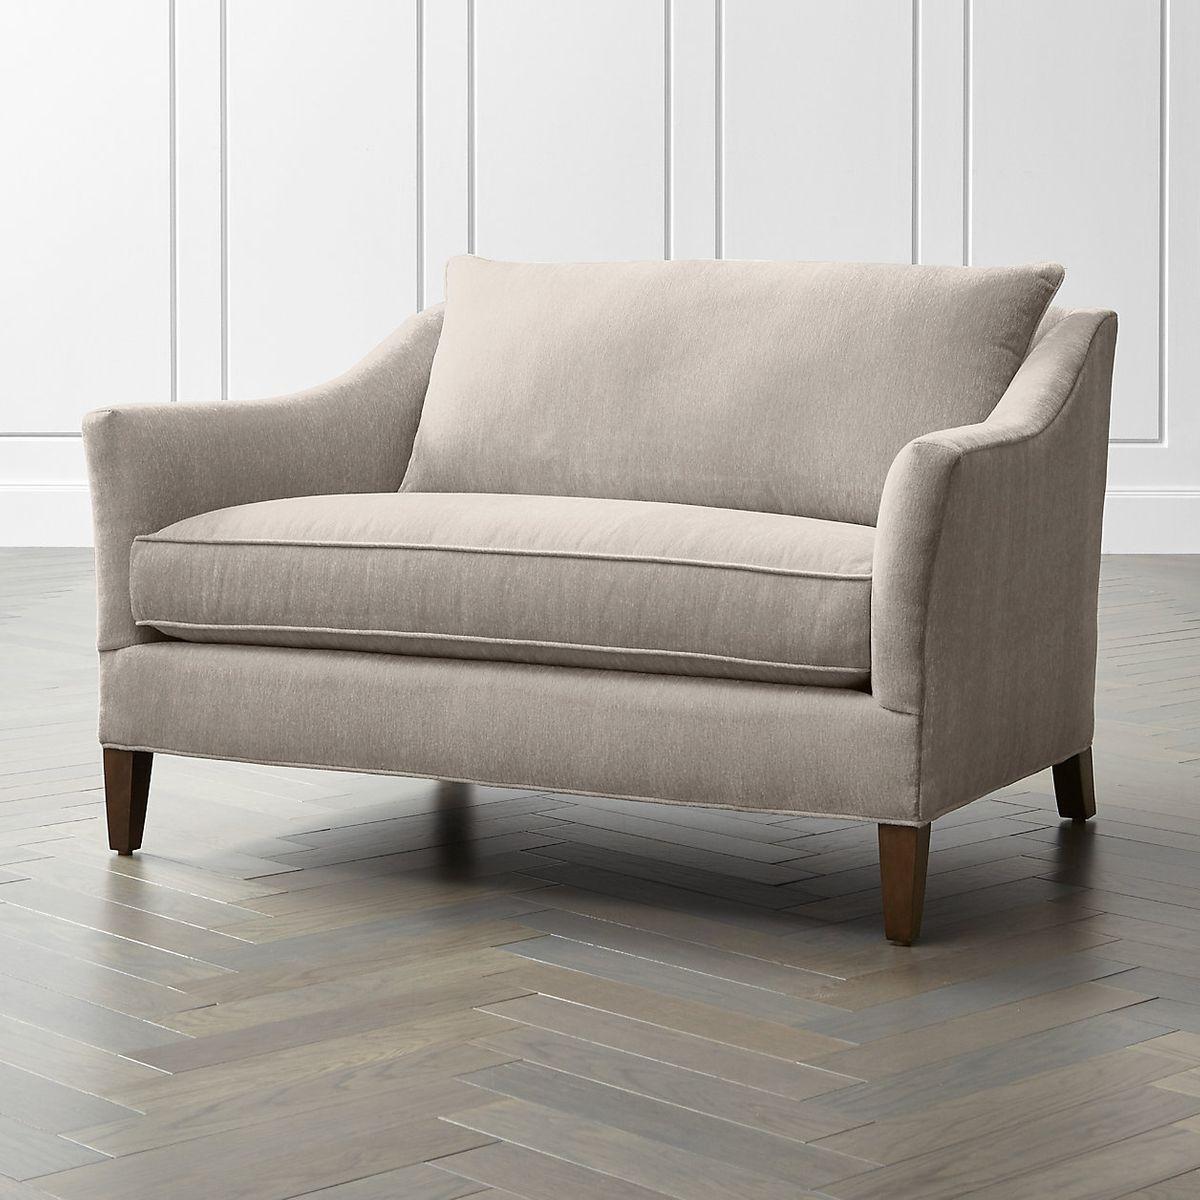 Wide beige one-seat sofa.